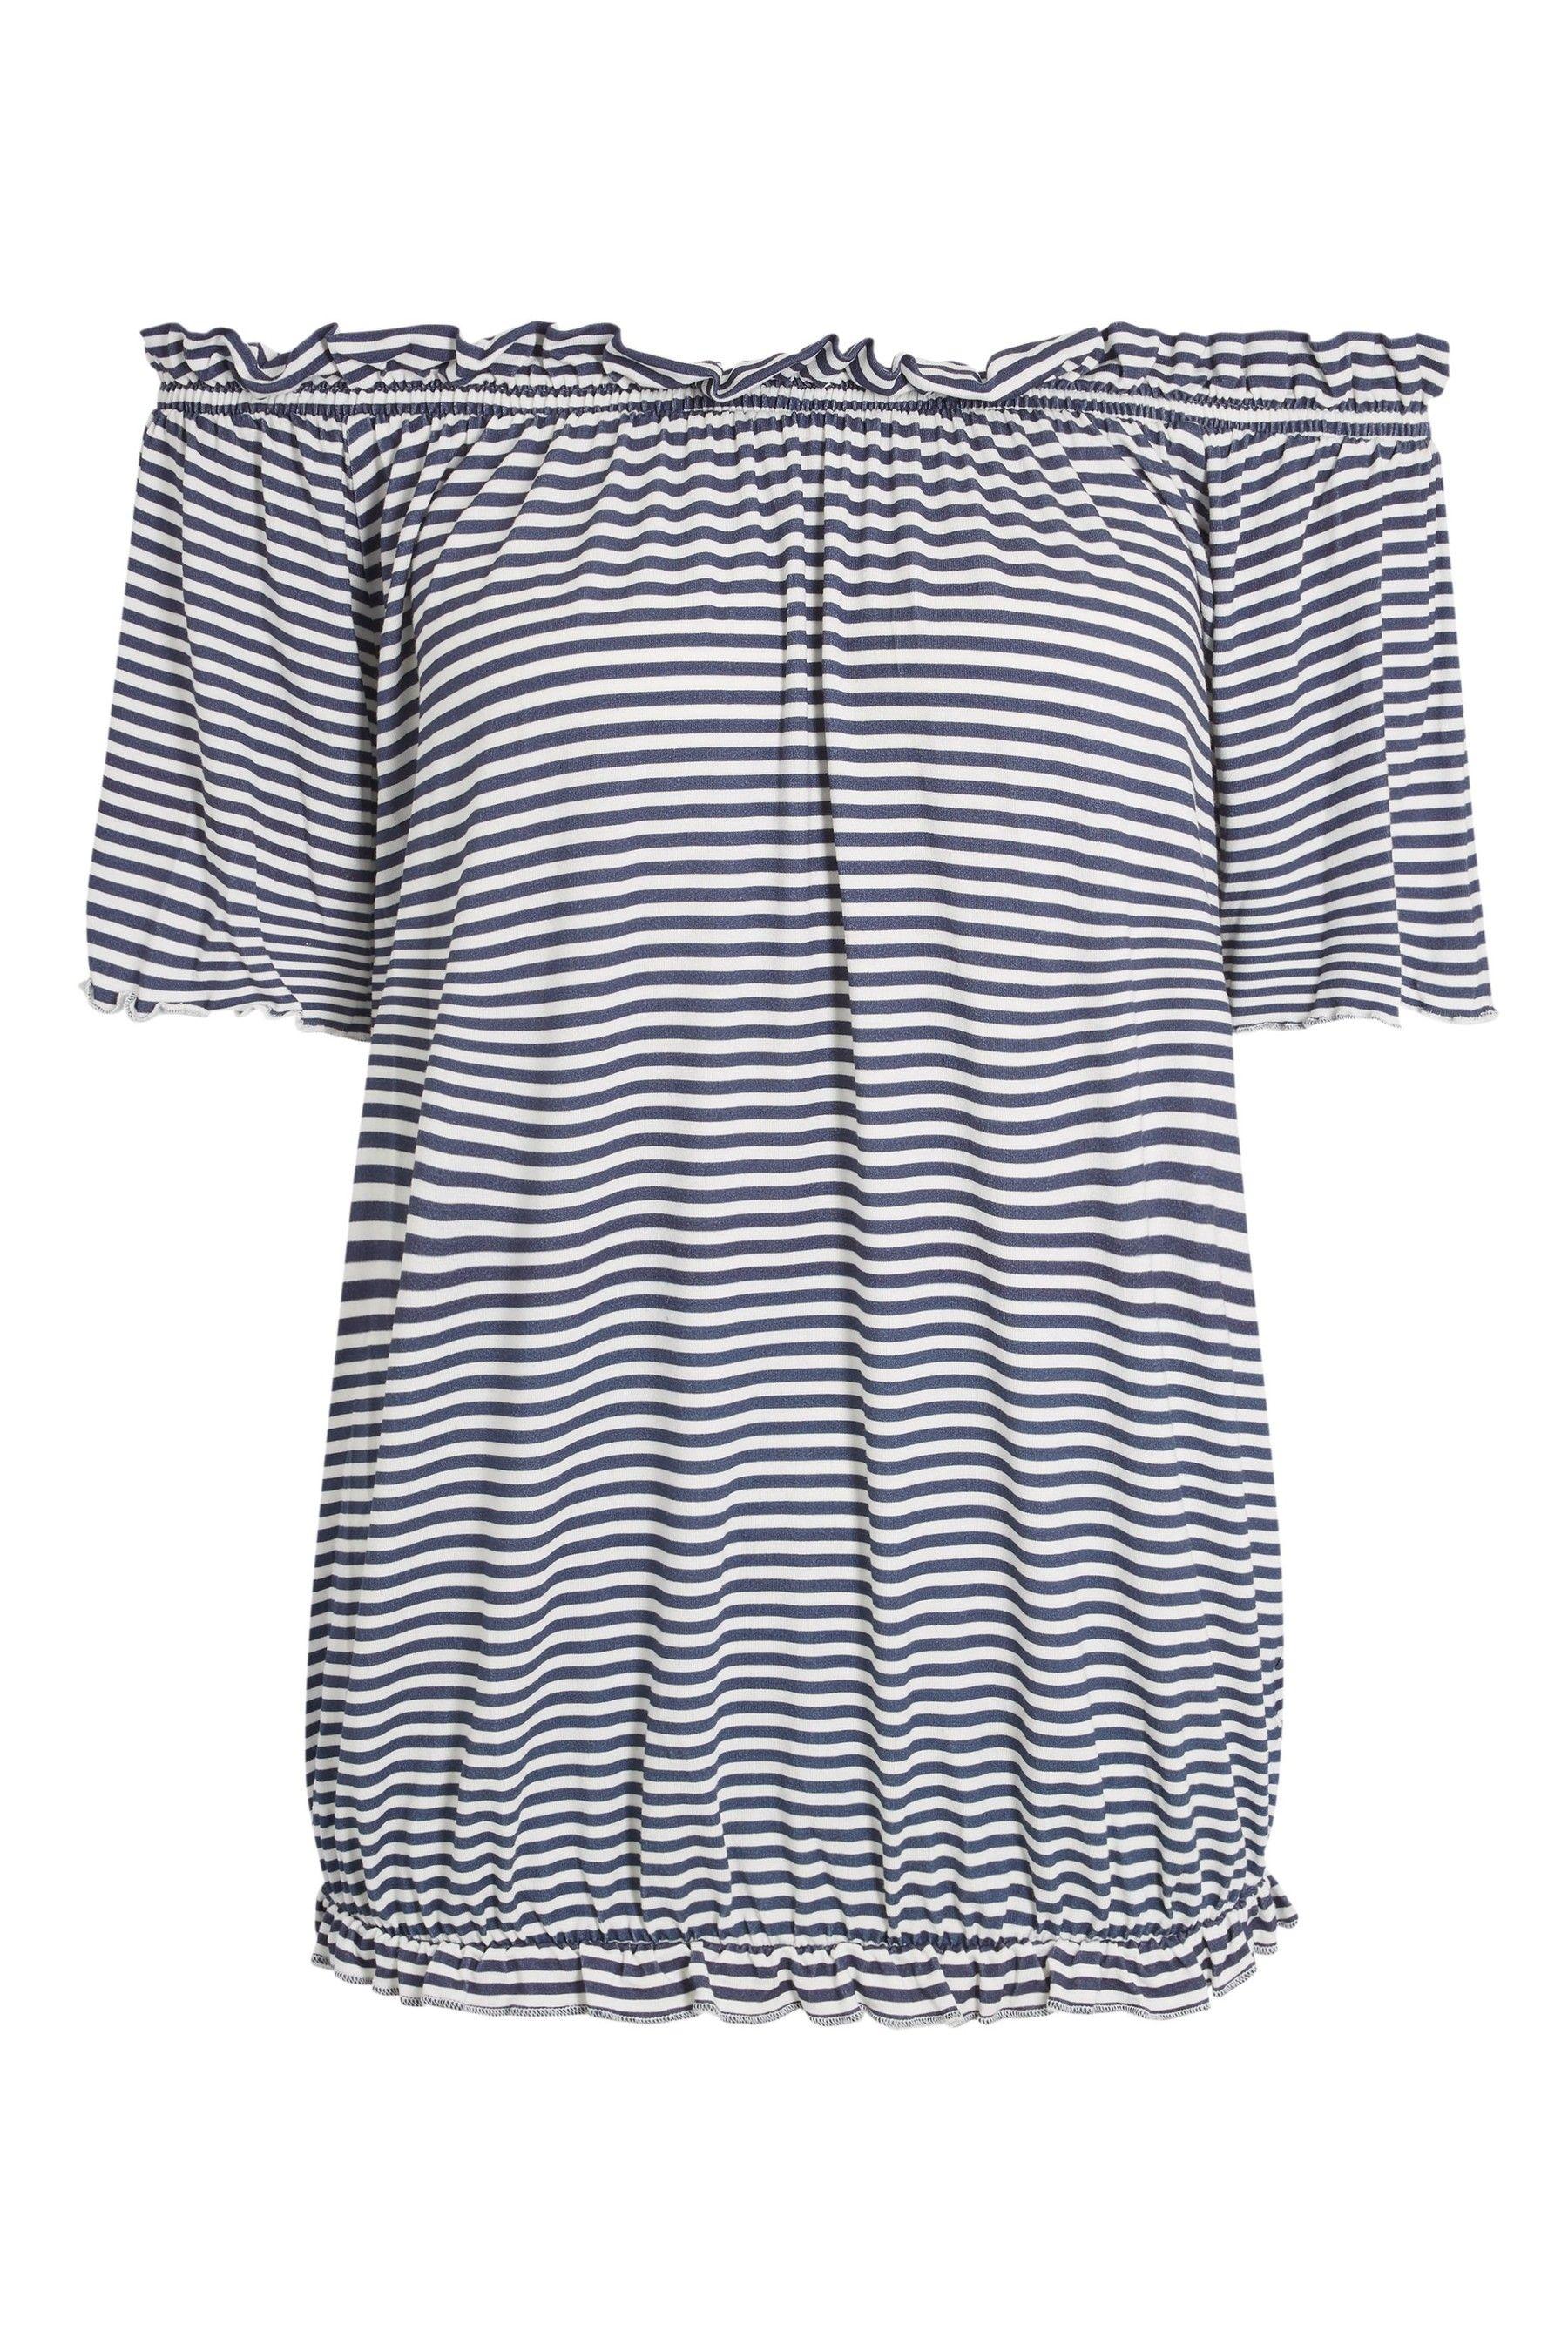 ac148fa298b3d3 Womens Next Navy/White Stripe Bardot Top - Blue | Products | Striped ...